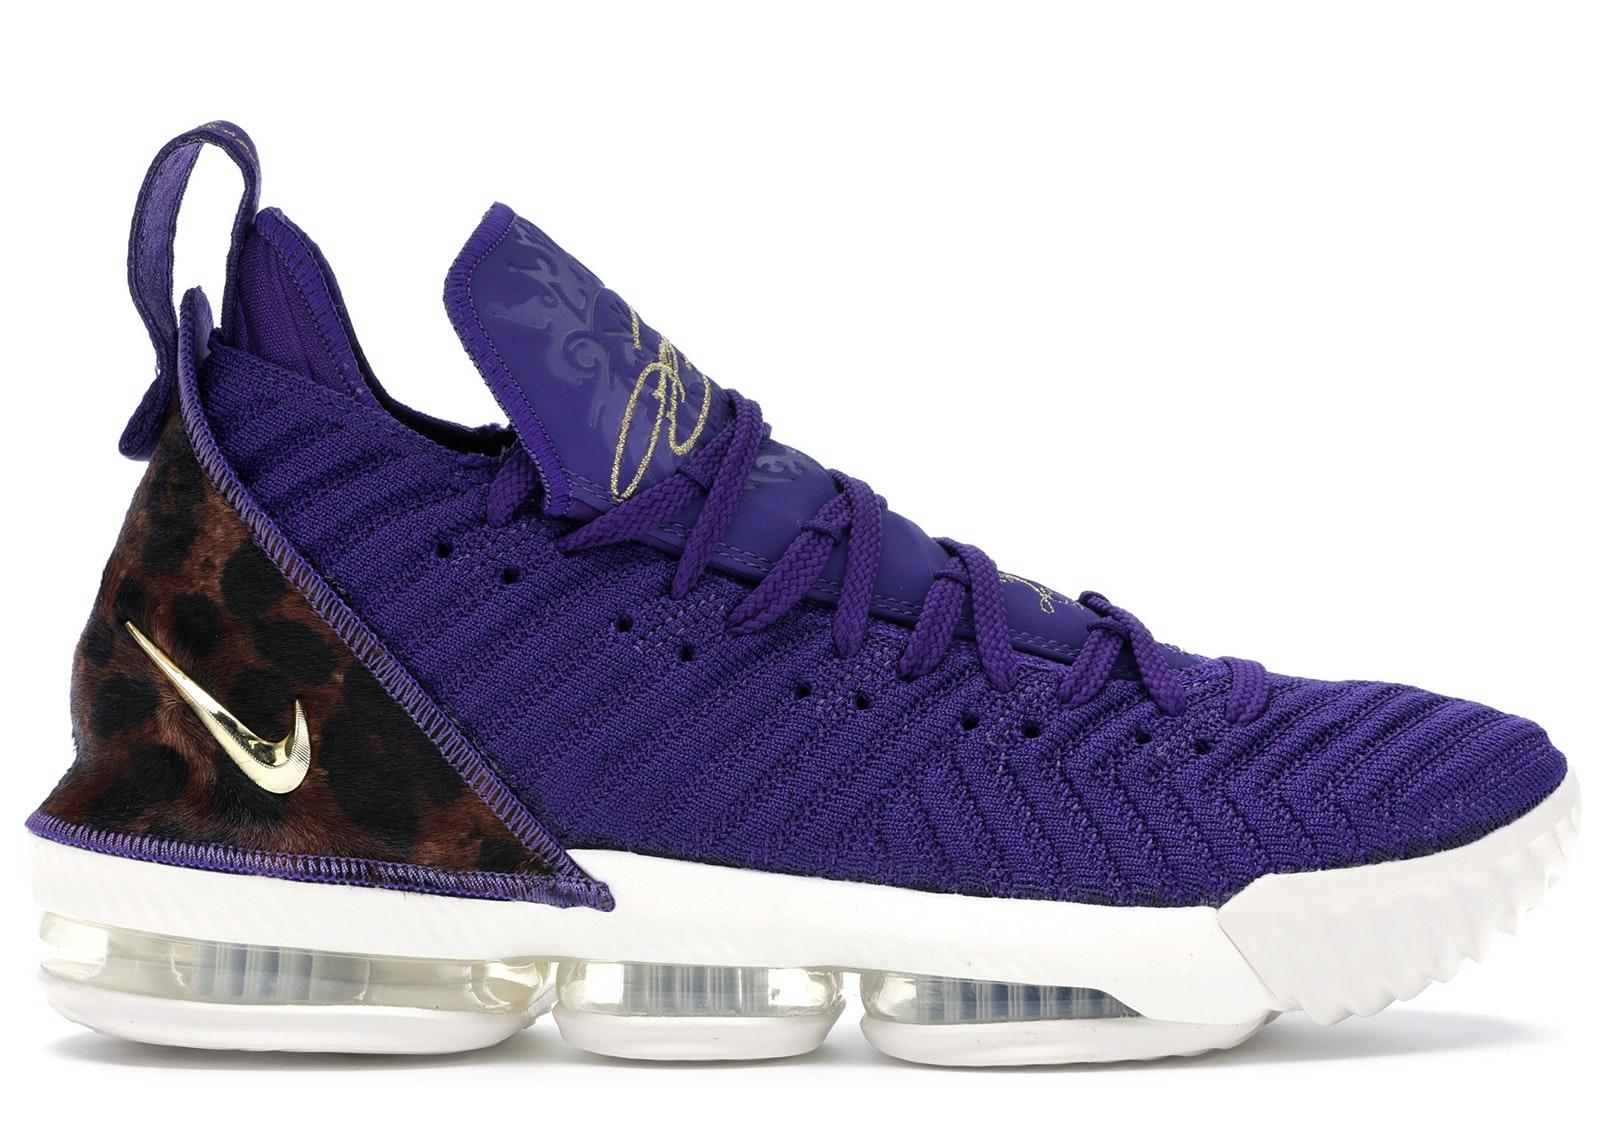 Lebron 16 King Court Purple